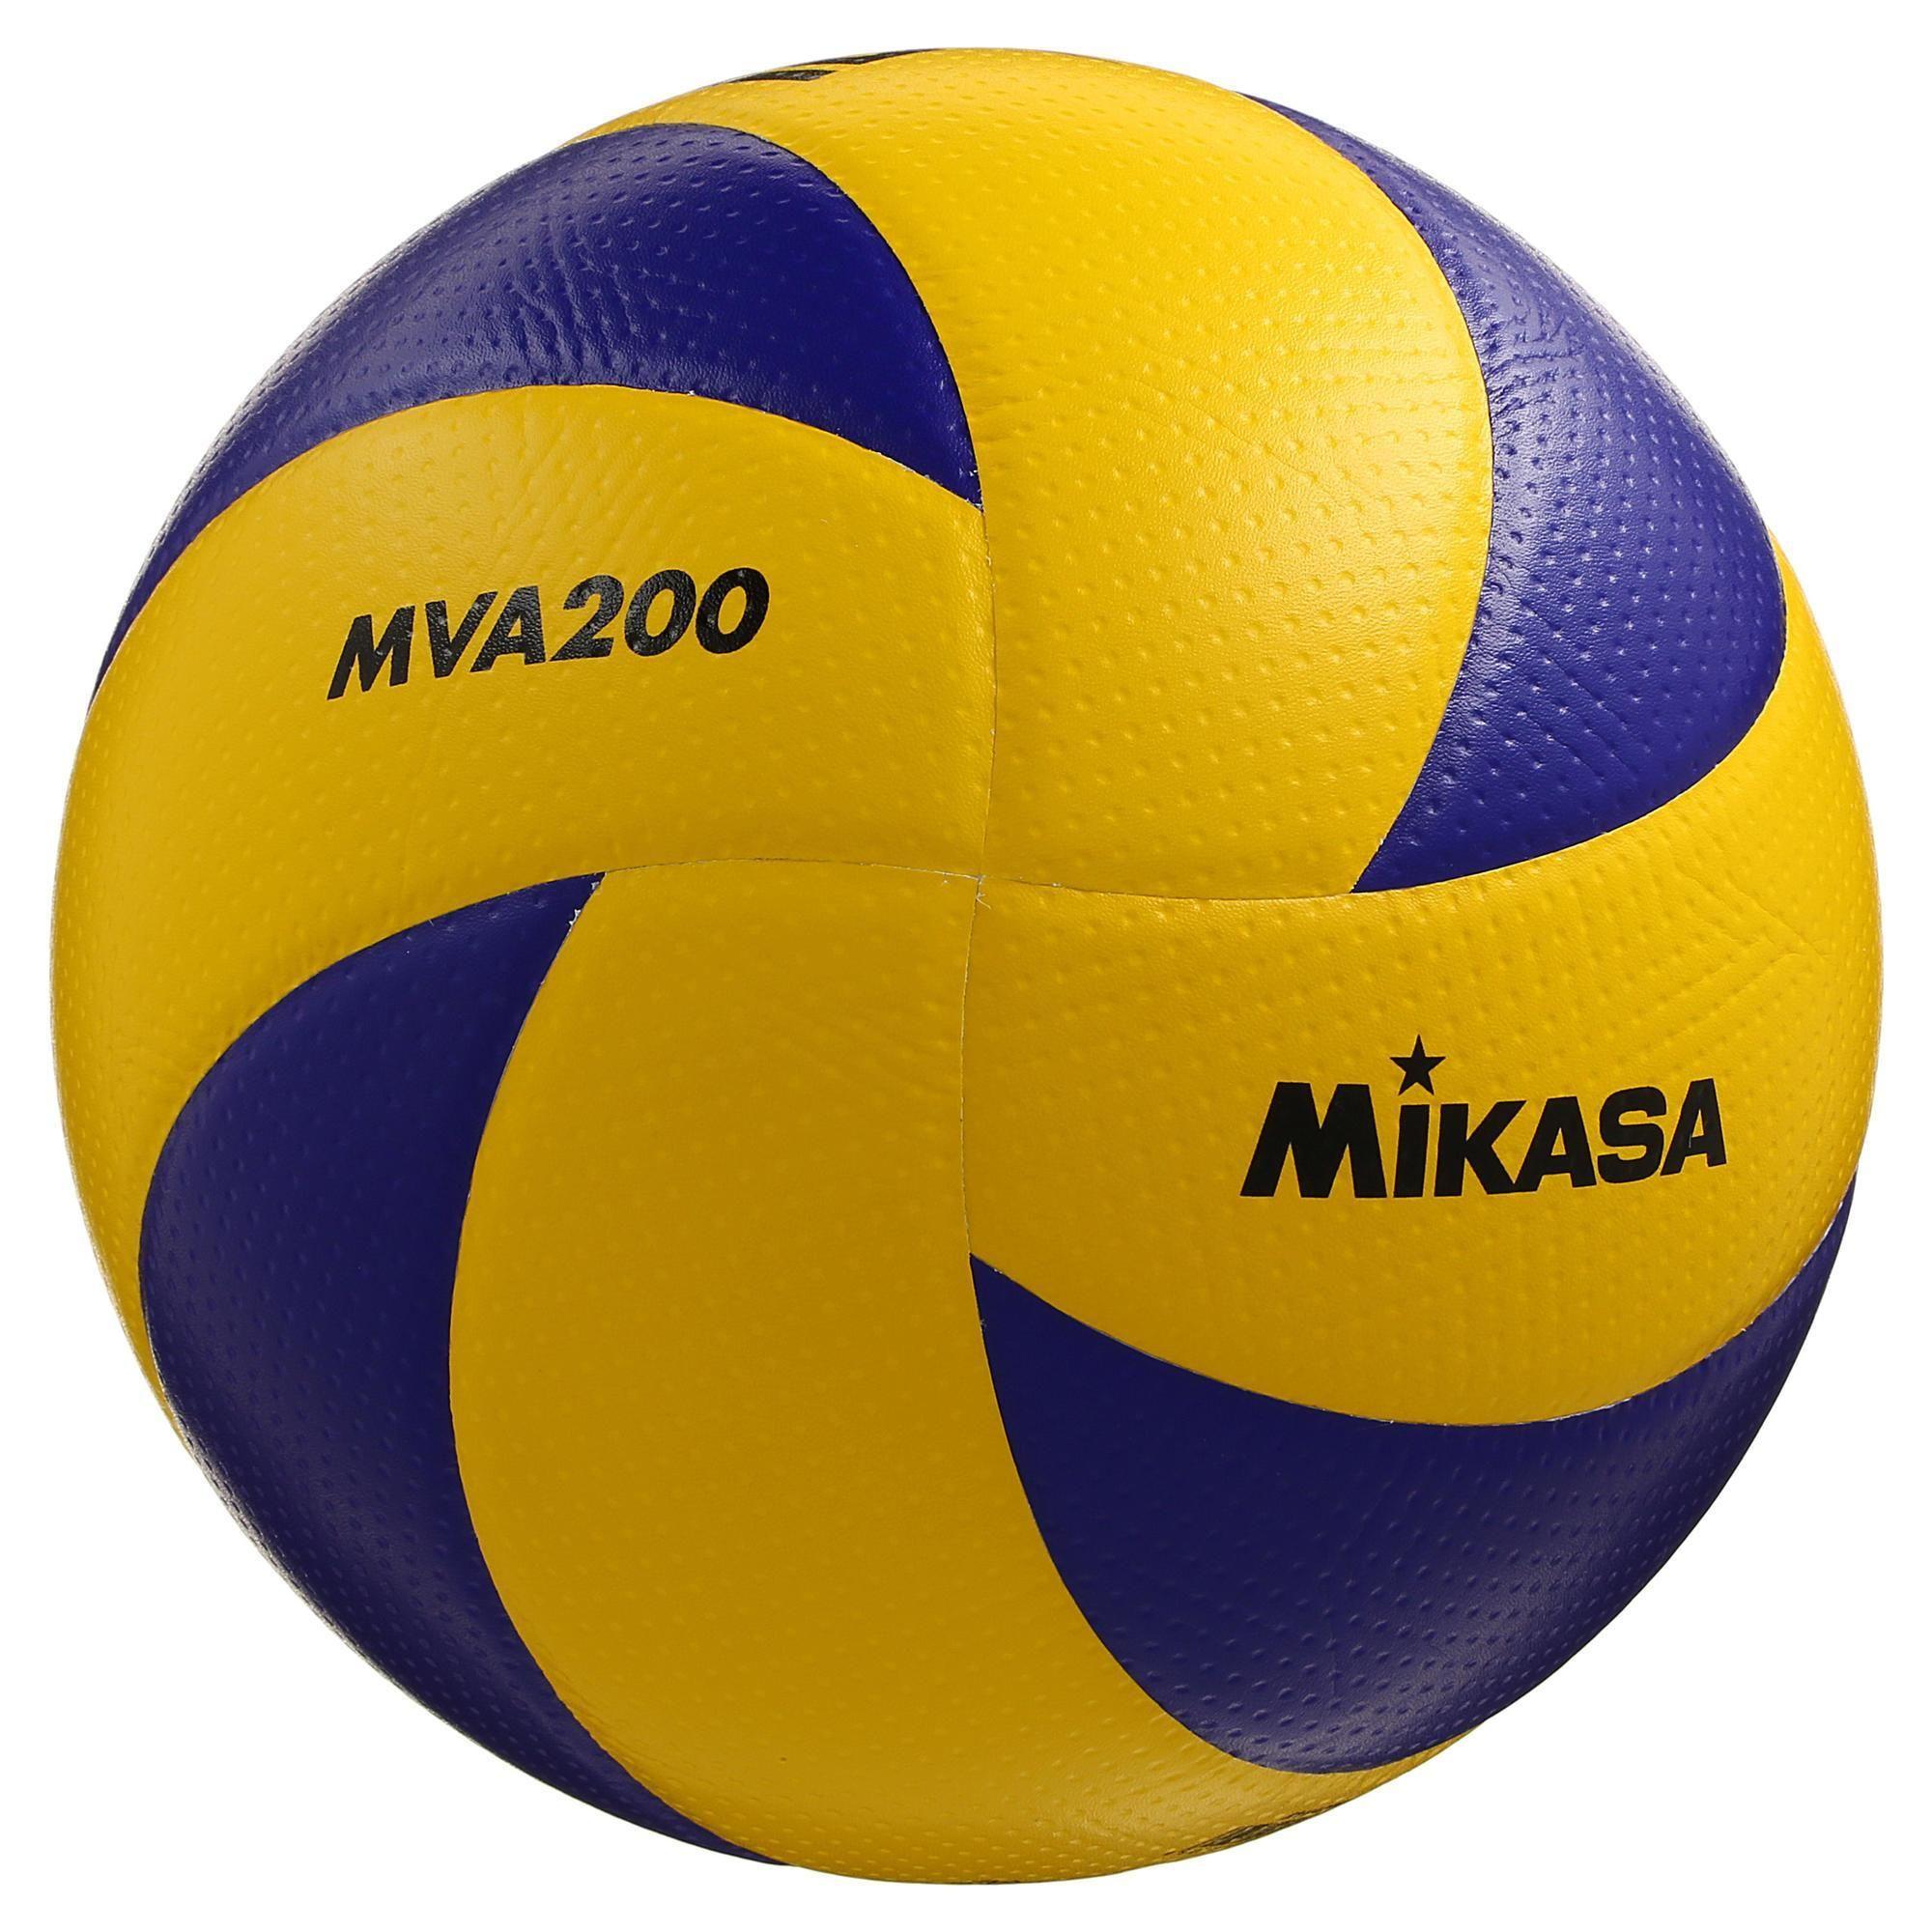 Mikasa Volleybal Mva 200 Geel Blauw In 2020 Volleybal Mikasa Blauw